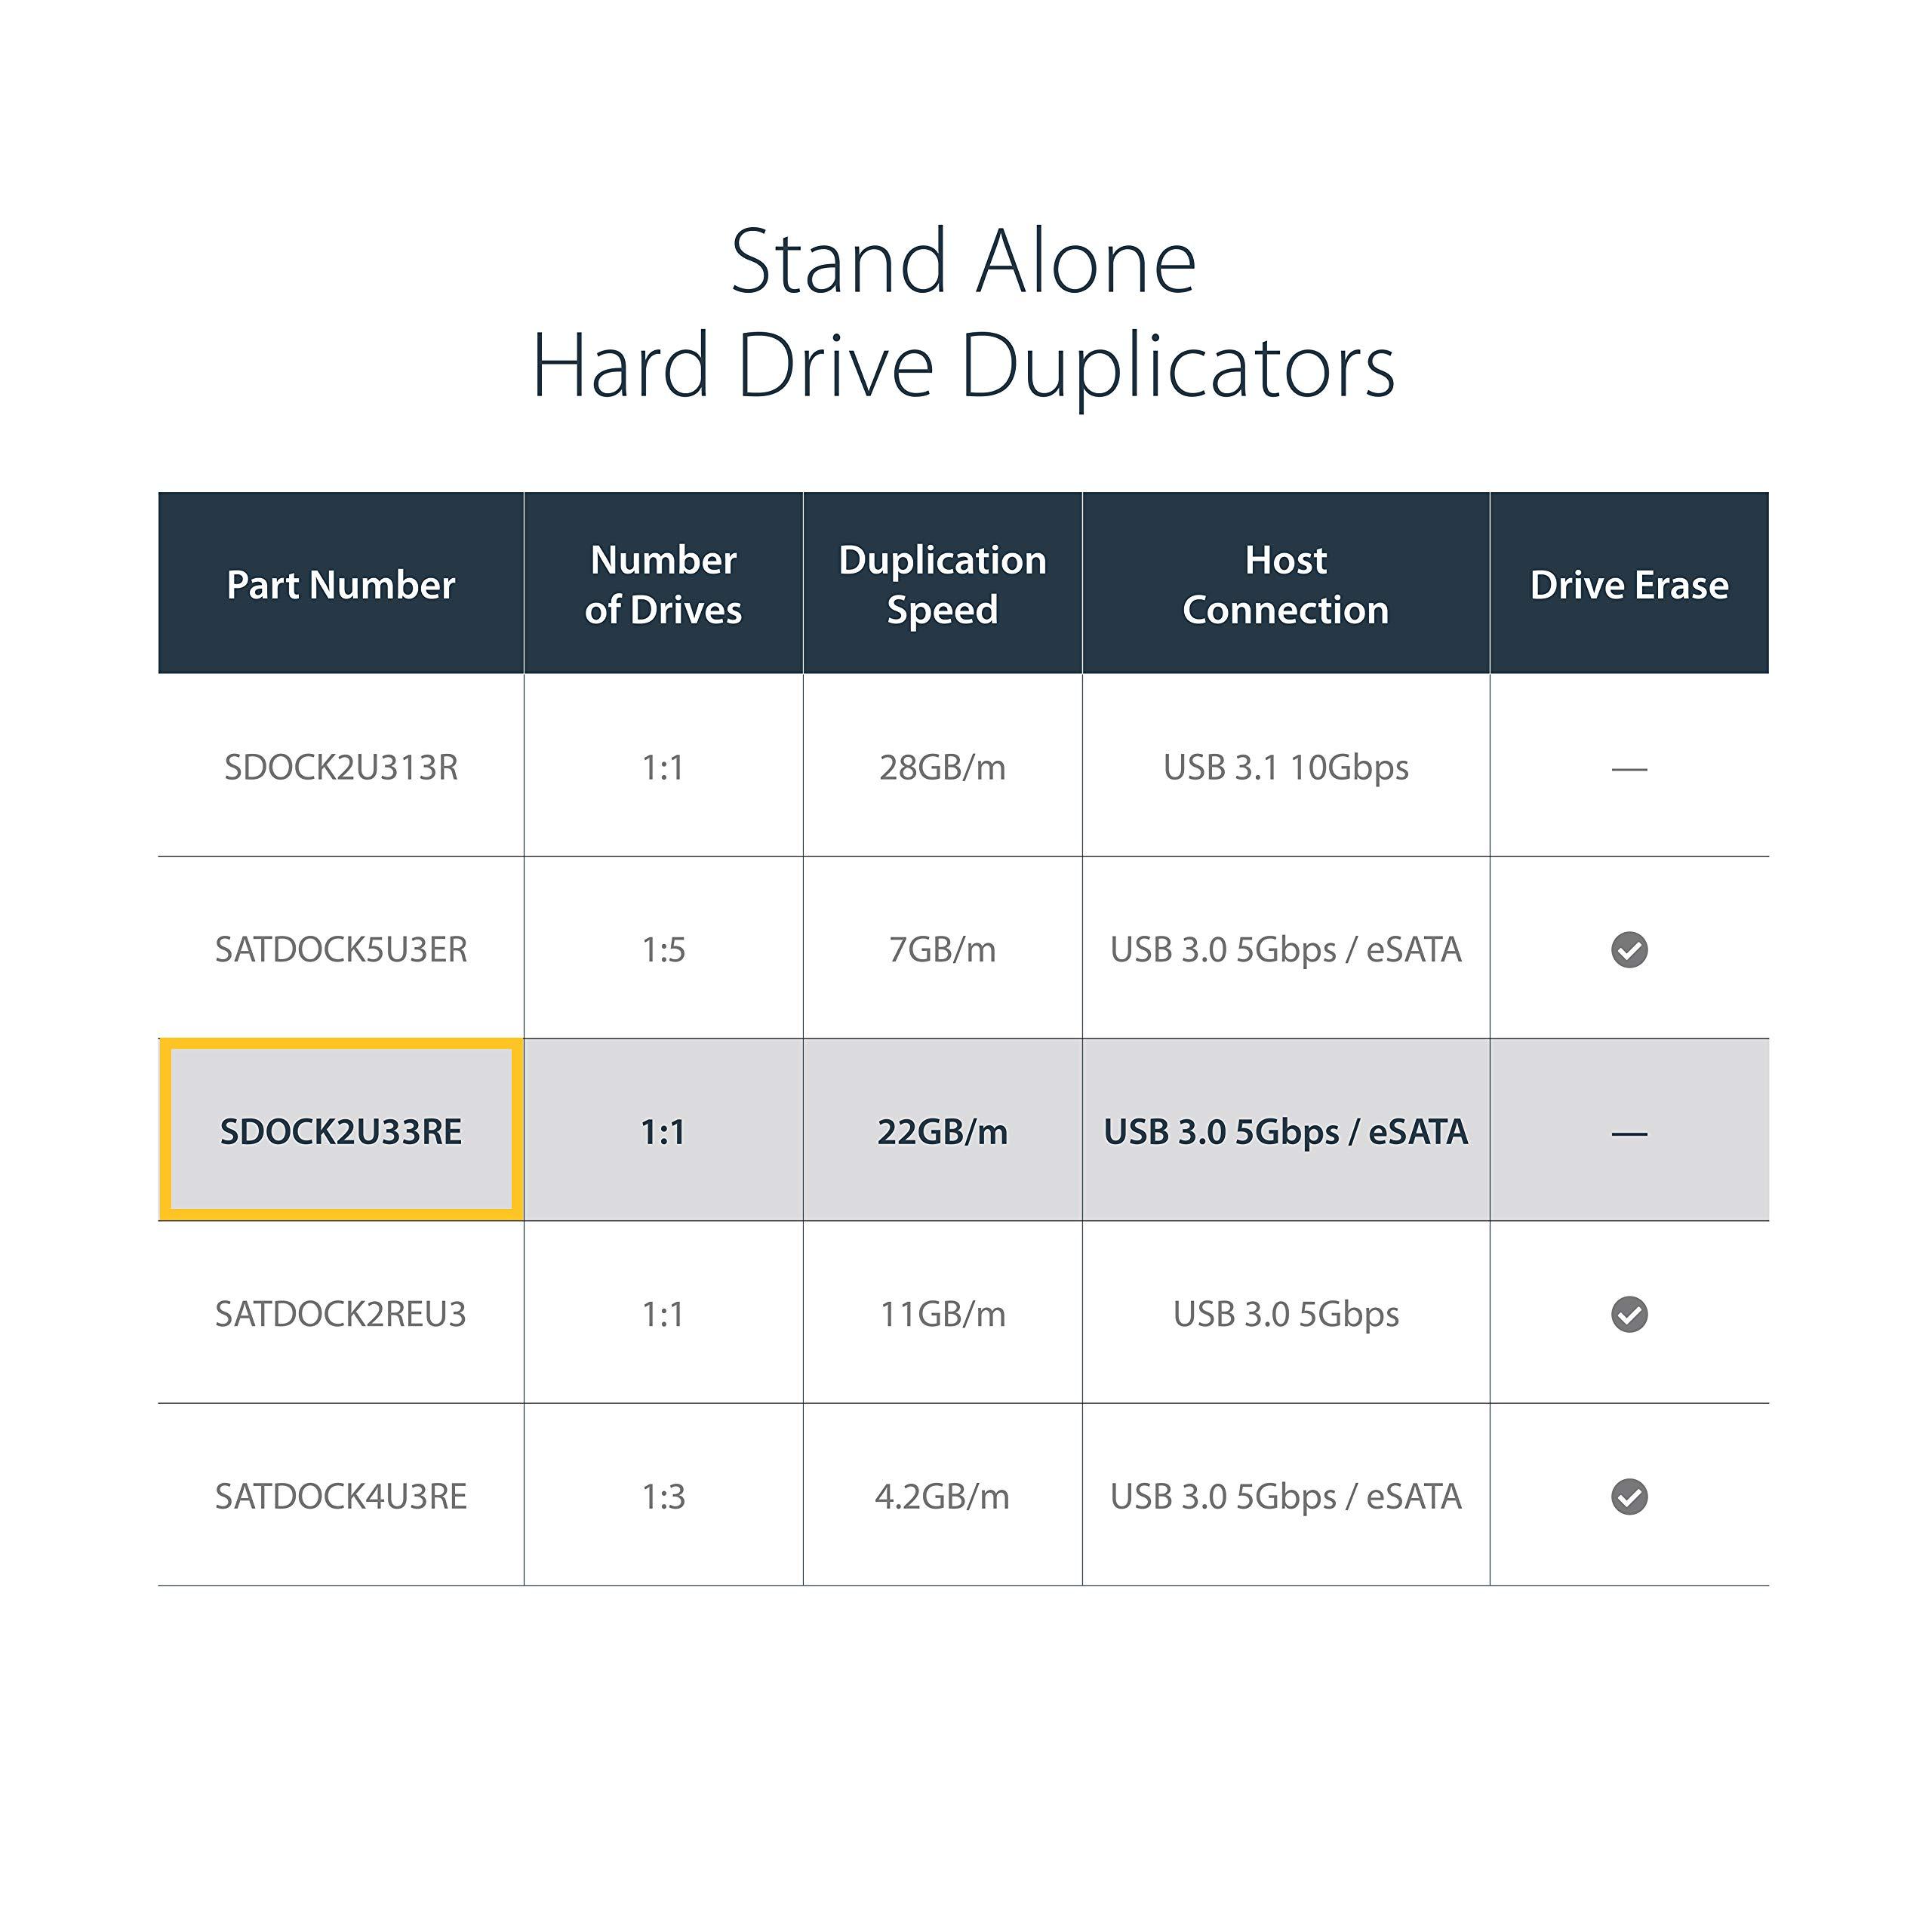 StarTech SDOCK2U33RE - Copiadora de Unidades para Disco (USB 3.0 y eSATA, SATA 6Gbps de 2.5